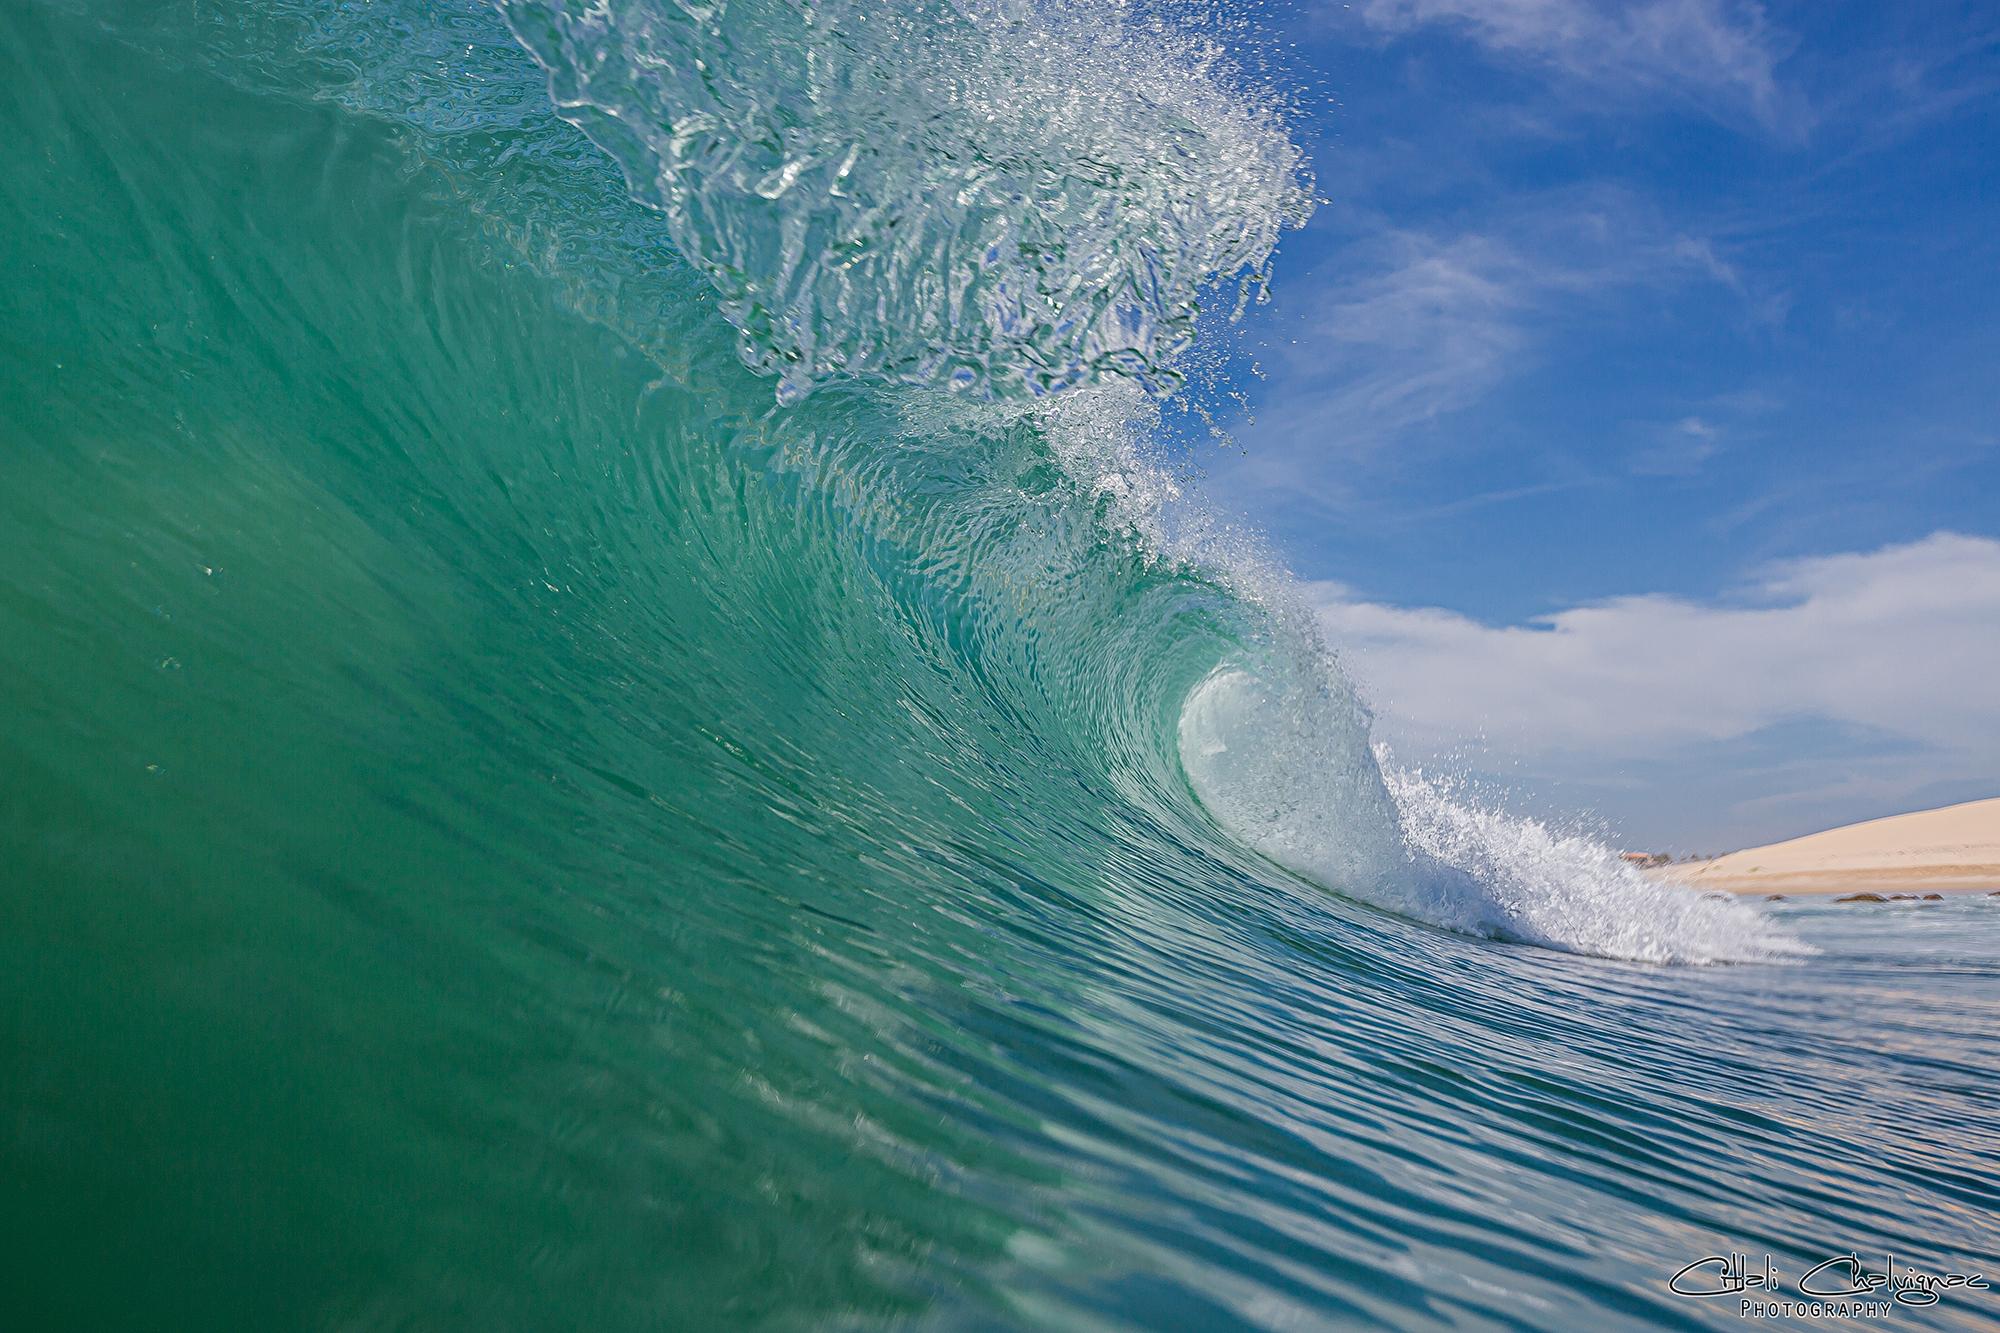 Galeria Ocean imagen 6 Citlali Chalvignac